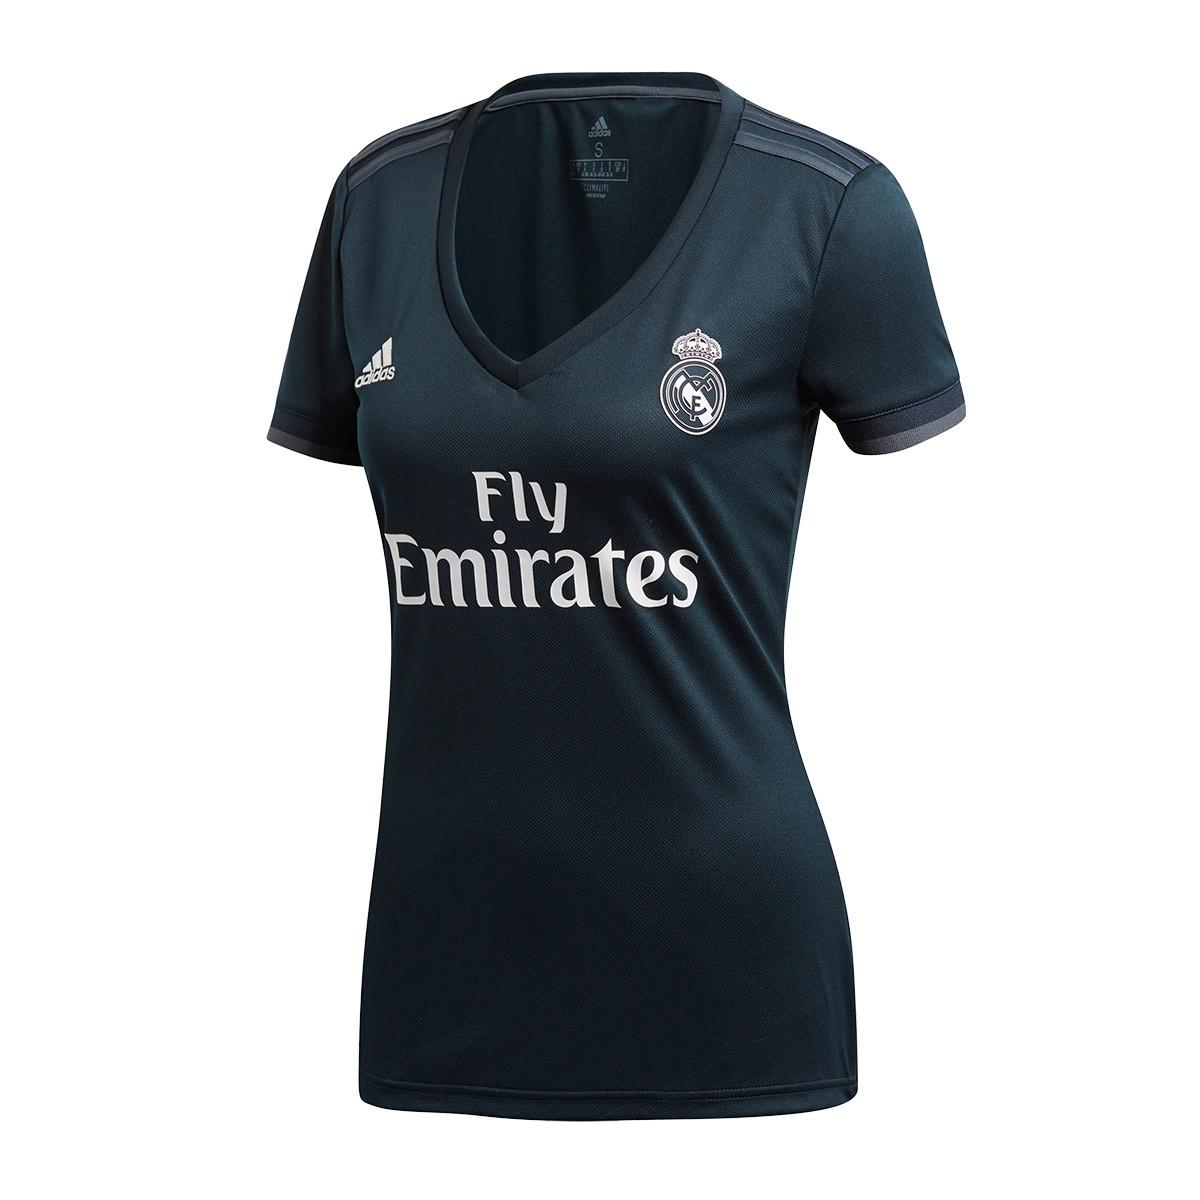 99b93d837 Jersey adidas Woman Real Madrid 2018-2019 Away Tech onix-Bold onix ...